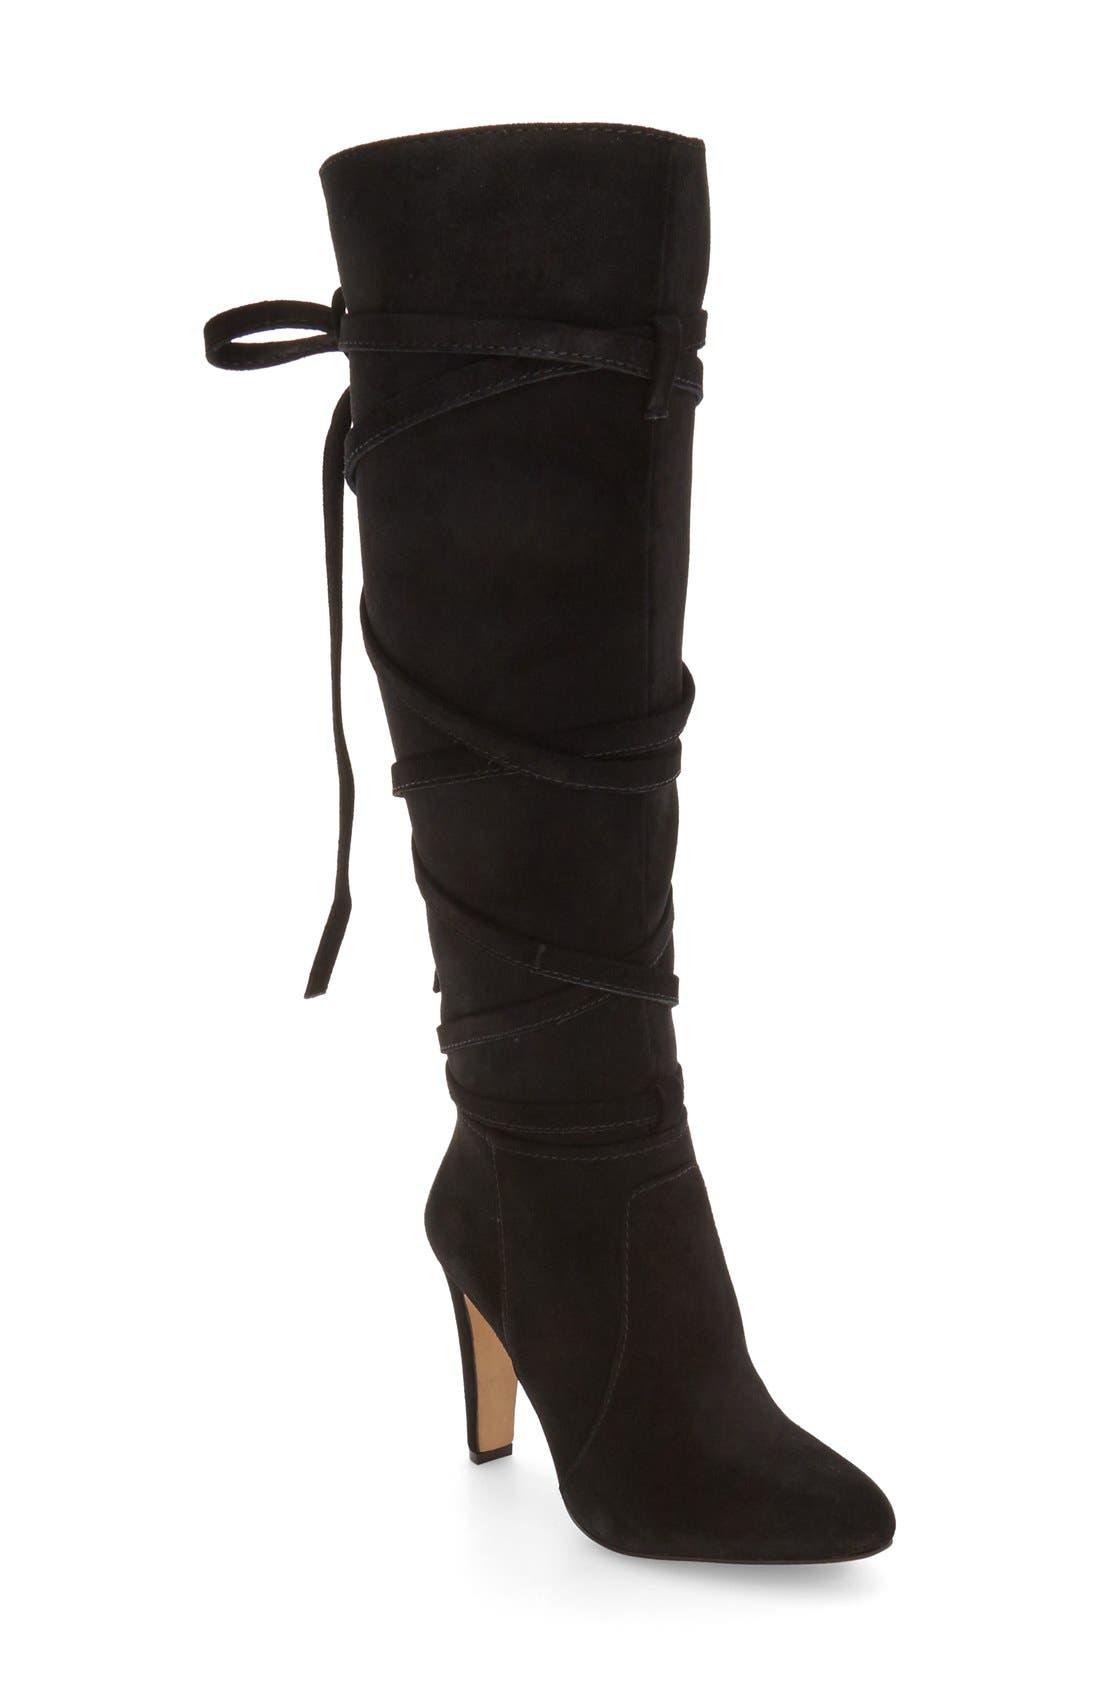 VINCE CAMUTO, 'Millay' Knee High Boot, Main thumbnail 1, color, 002